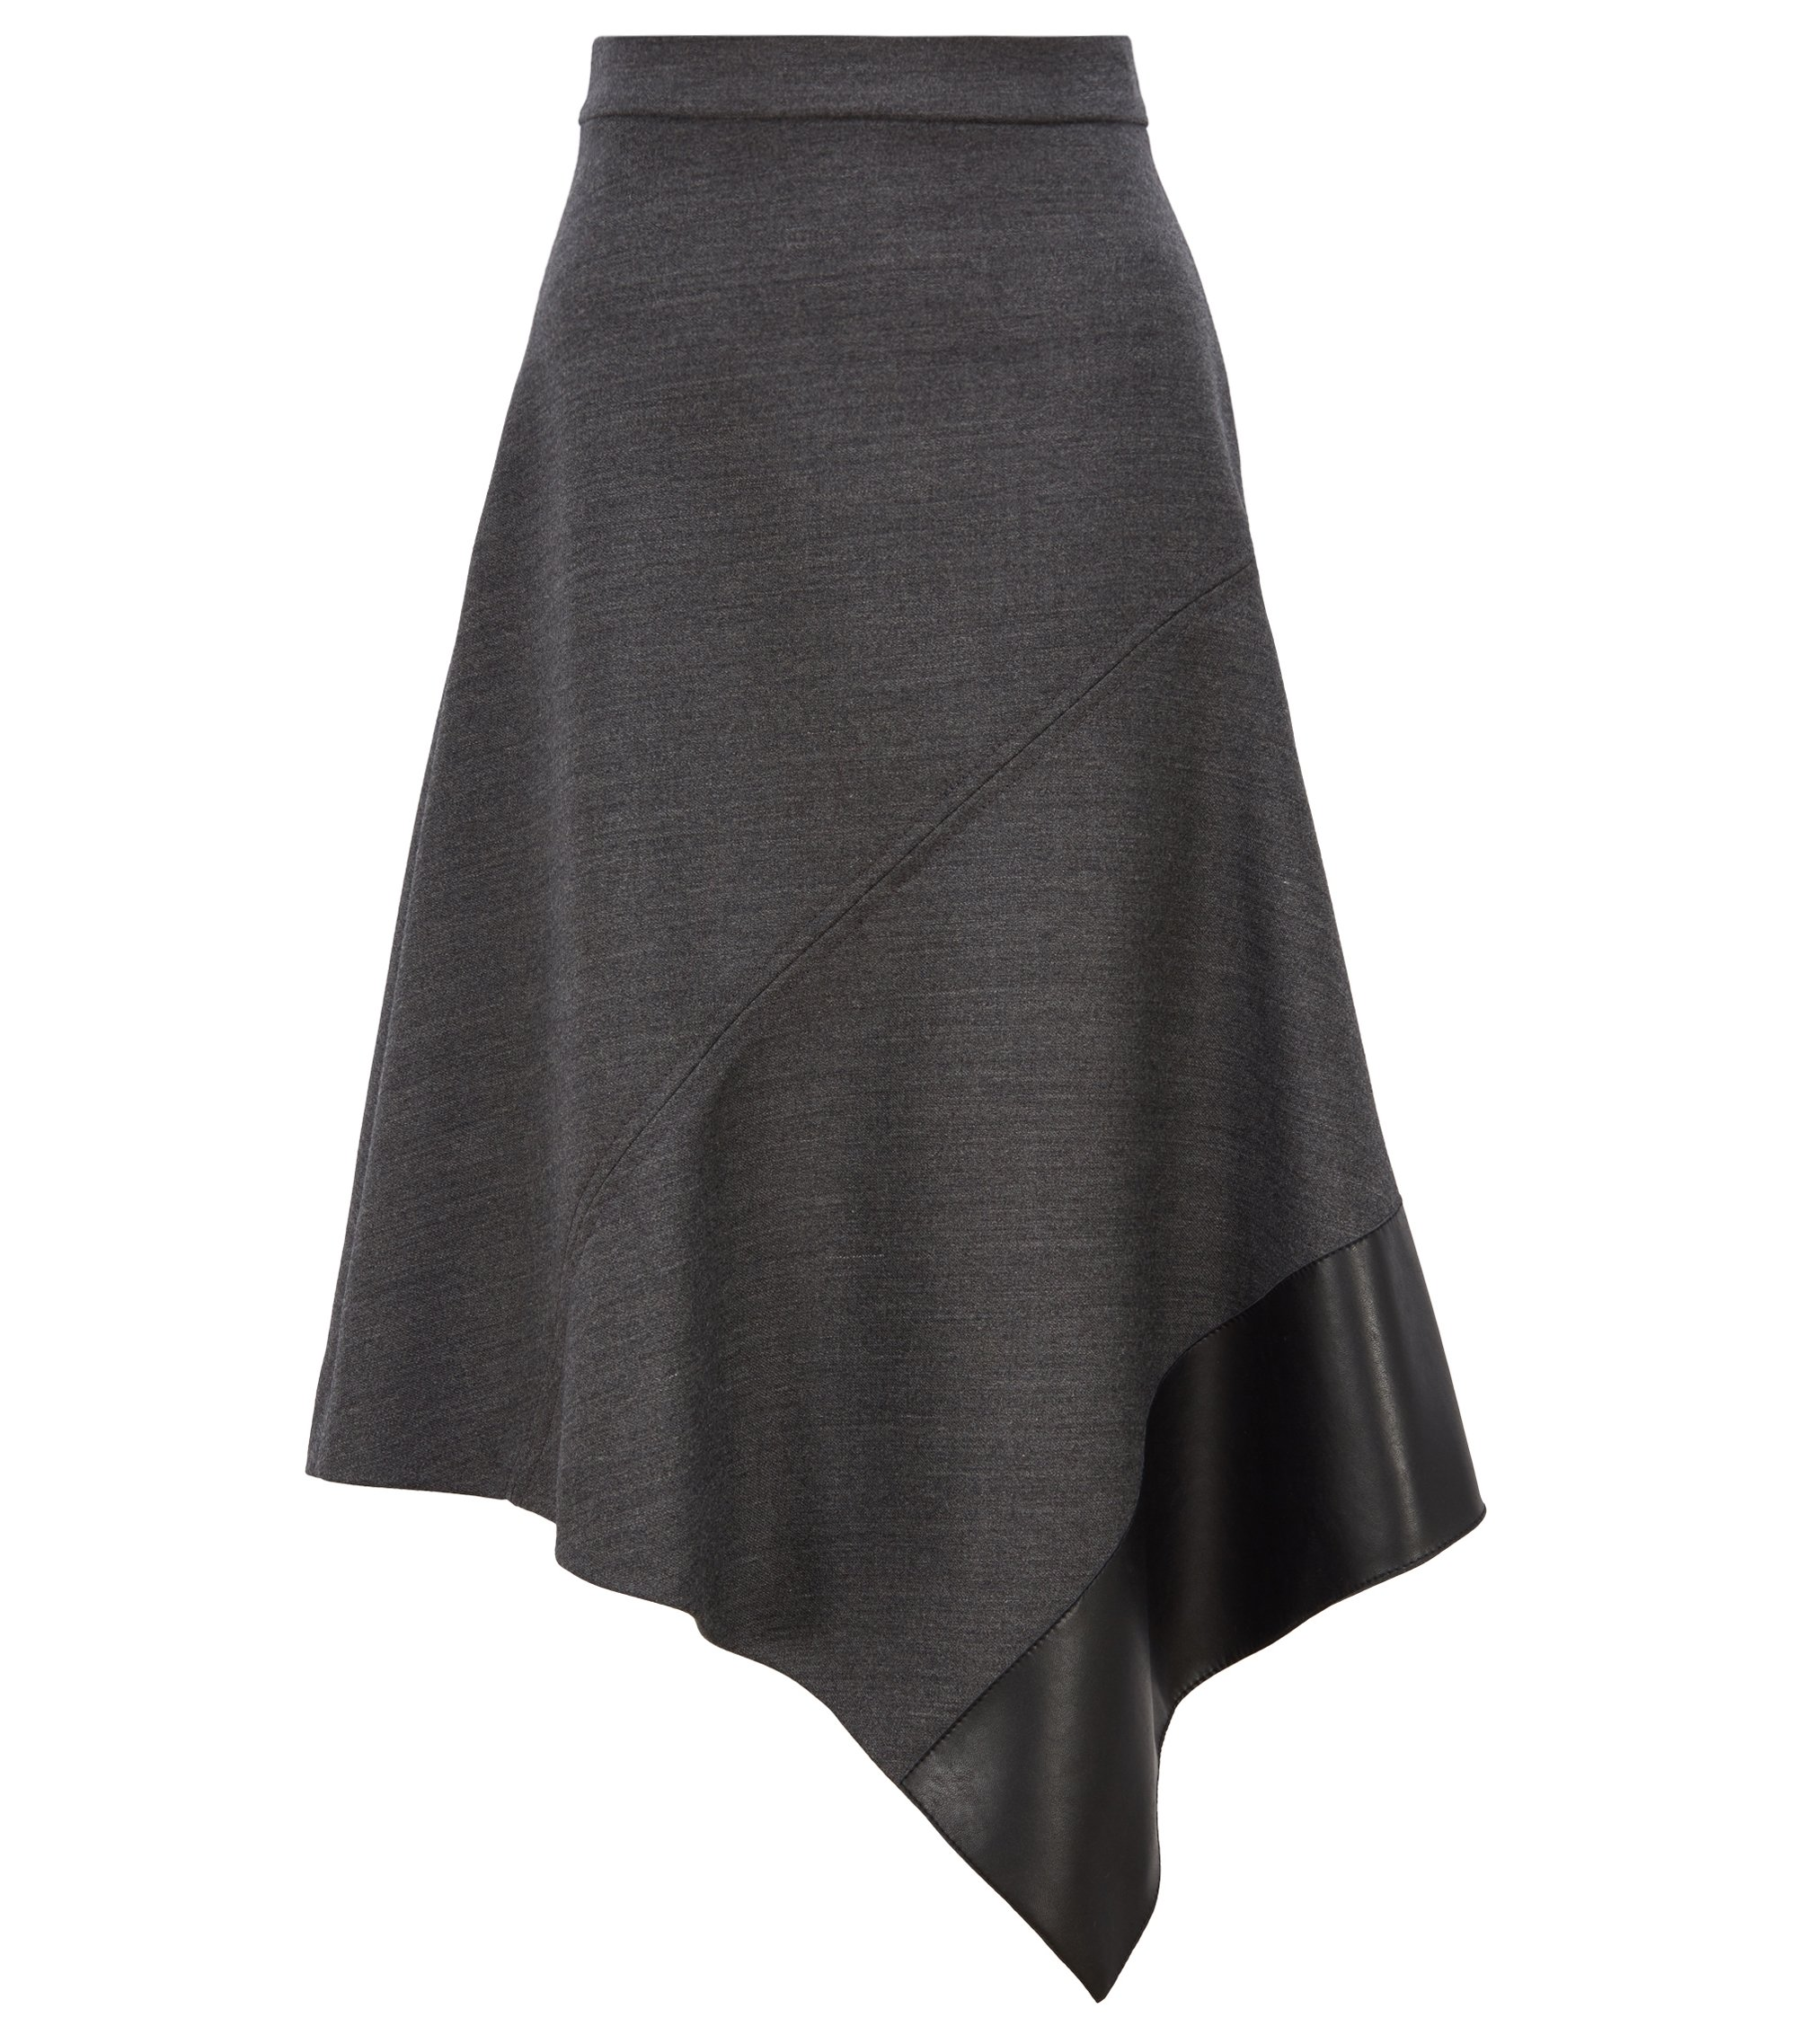 A-line skirt in Italian virgin wool with asymmetric hemline, Charcoal